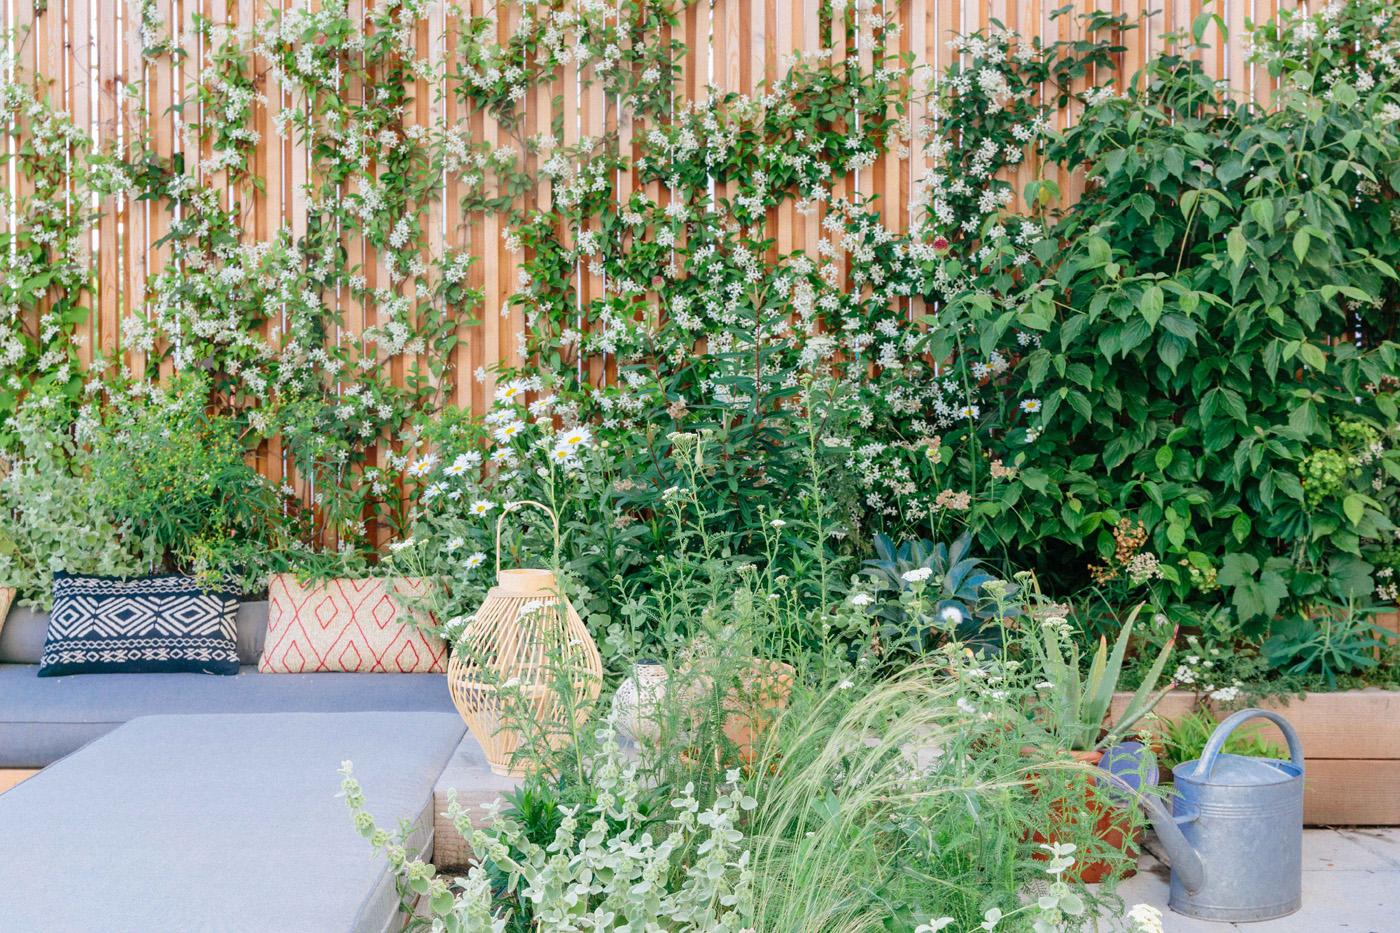 39-Lili Garden Terrasse Romainville Details